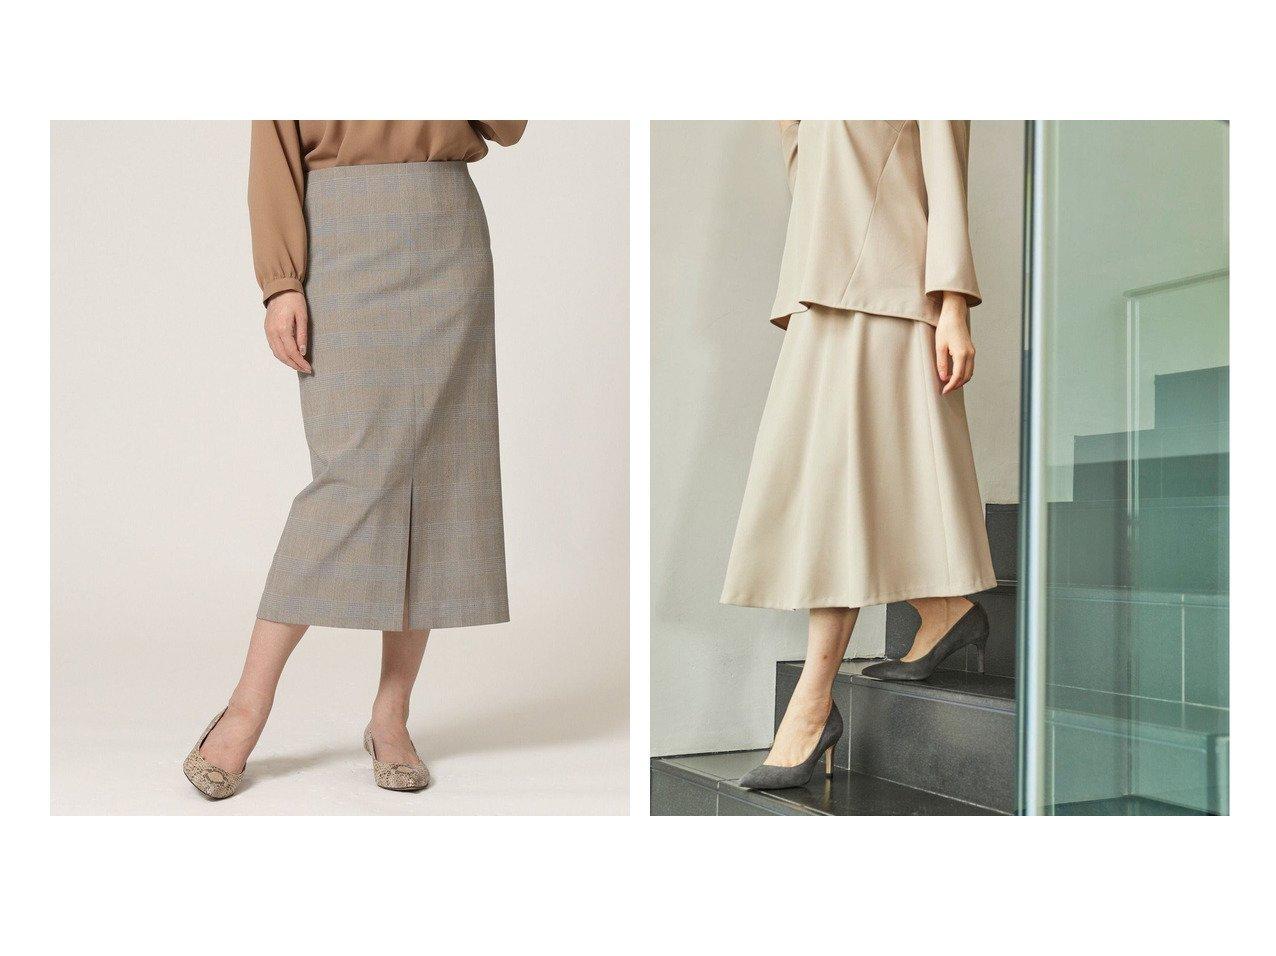 【KASHIYAMA EASY/カシヤマ イージー】のオックス 2wayストレッチ フレアスカート&2Wayパワーストレッチグレンチェックタイトスカート 【スカート】おすすめ!人気、トレンド・レディースファッションの通販   おすすめで人気の流行・トレンド、ファッションの通販商品 インテリア・家具・メンズファッション・キッズファッション・レディースファッション・服の通販 founy(ファニー) https://founy.com/ ファッション Fashion レディースファッション WOMEN スカート Skirt Aライン/フレアスカート Flared A-Line Skirts おすすめ Recommend シンプル スリット スーツ セットアップ タイトスカート フロント ボトム ポケット オックス 春 Spring 吸水 軽量 ジャケット ストレッチ フレア リラックス S/S・春夏 SS・Spring/Summer 夏 Summer |ID:crp329100000057115